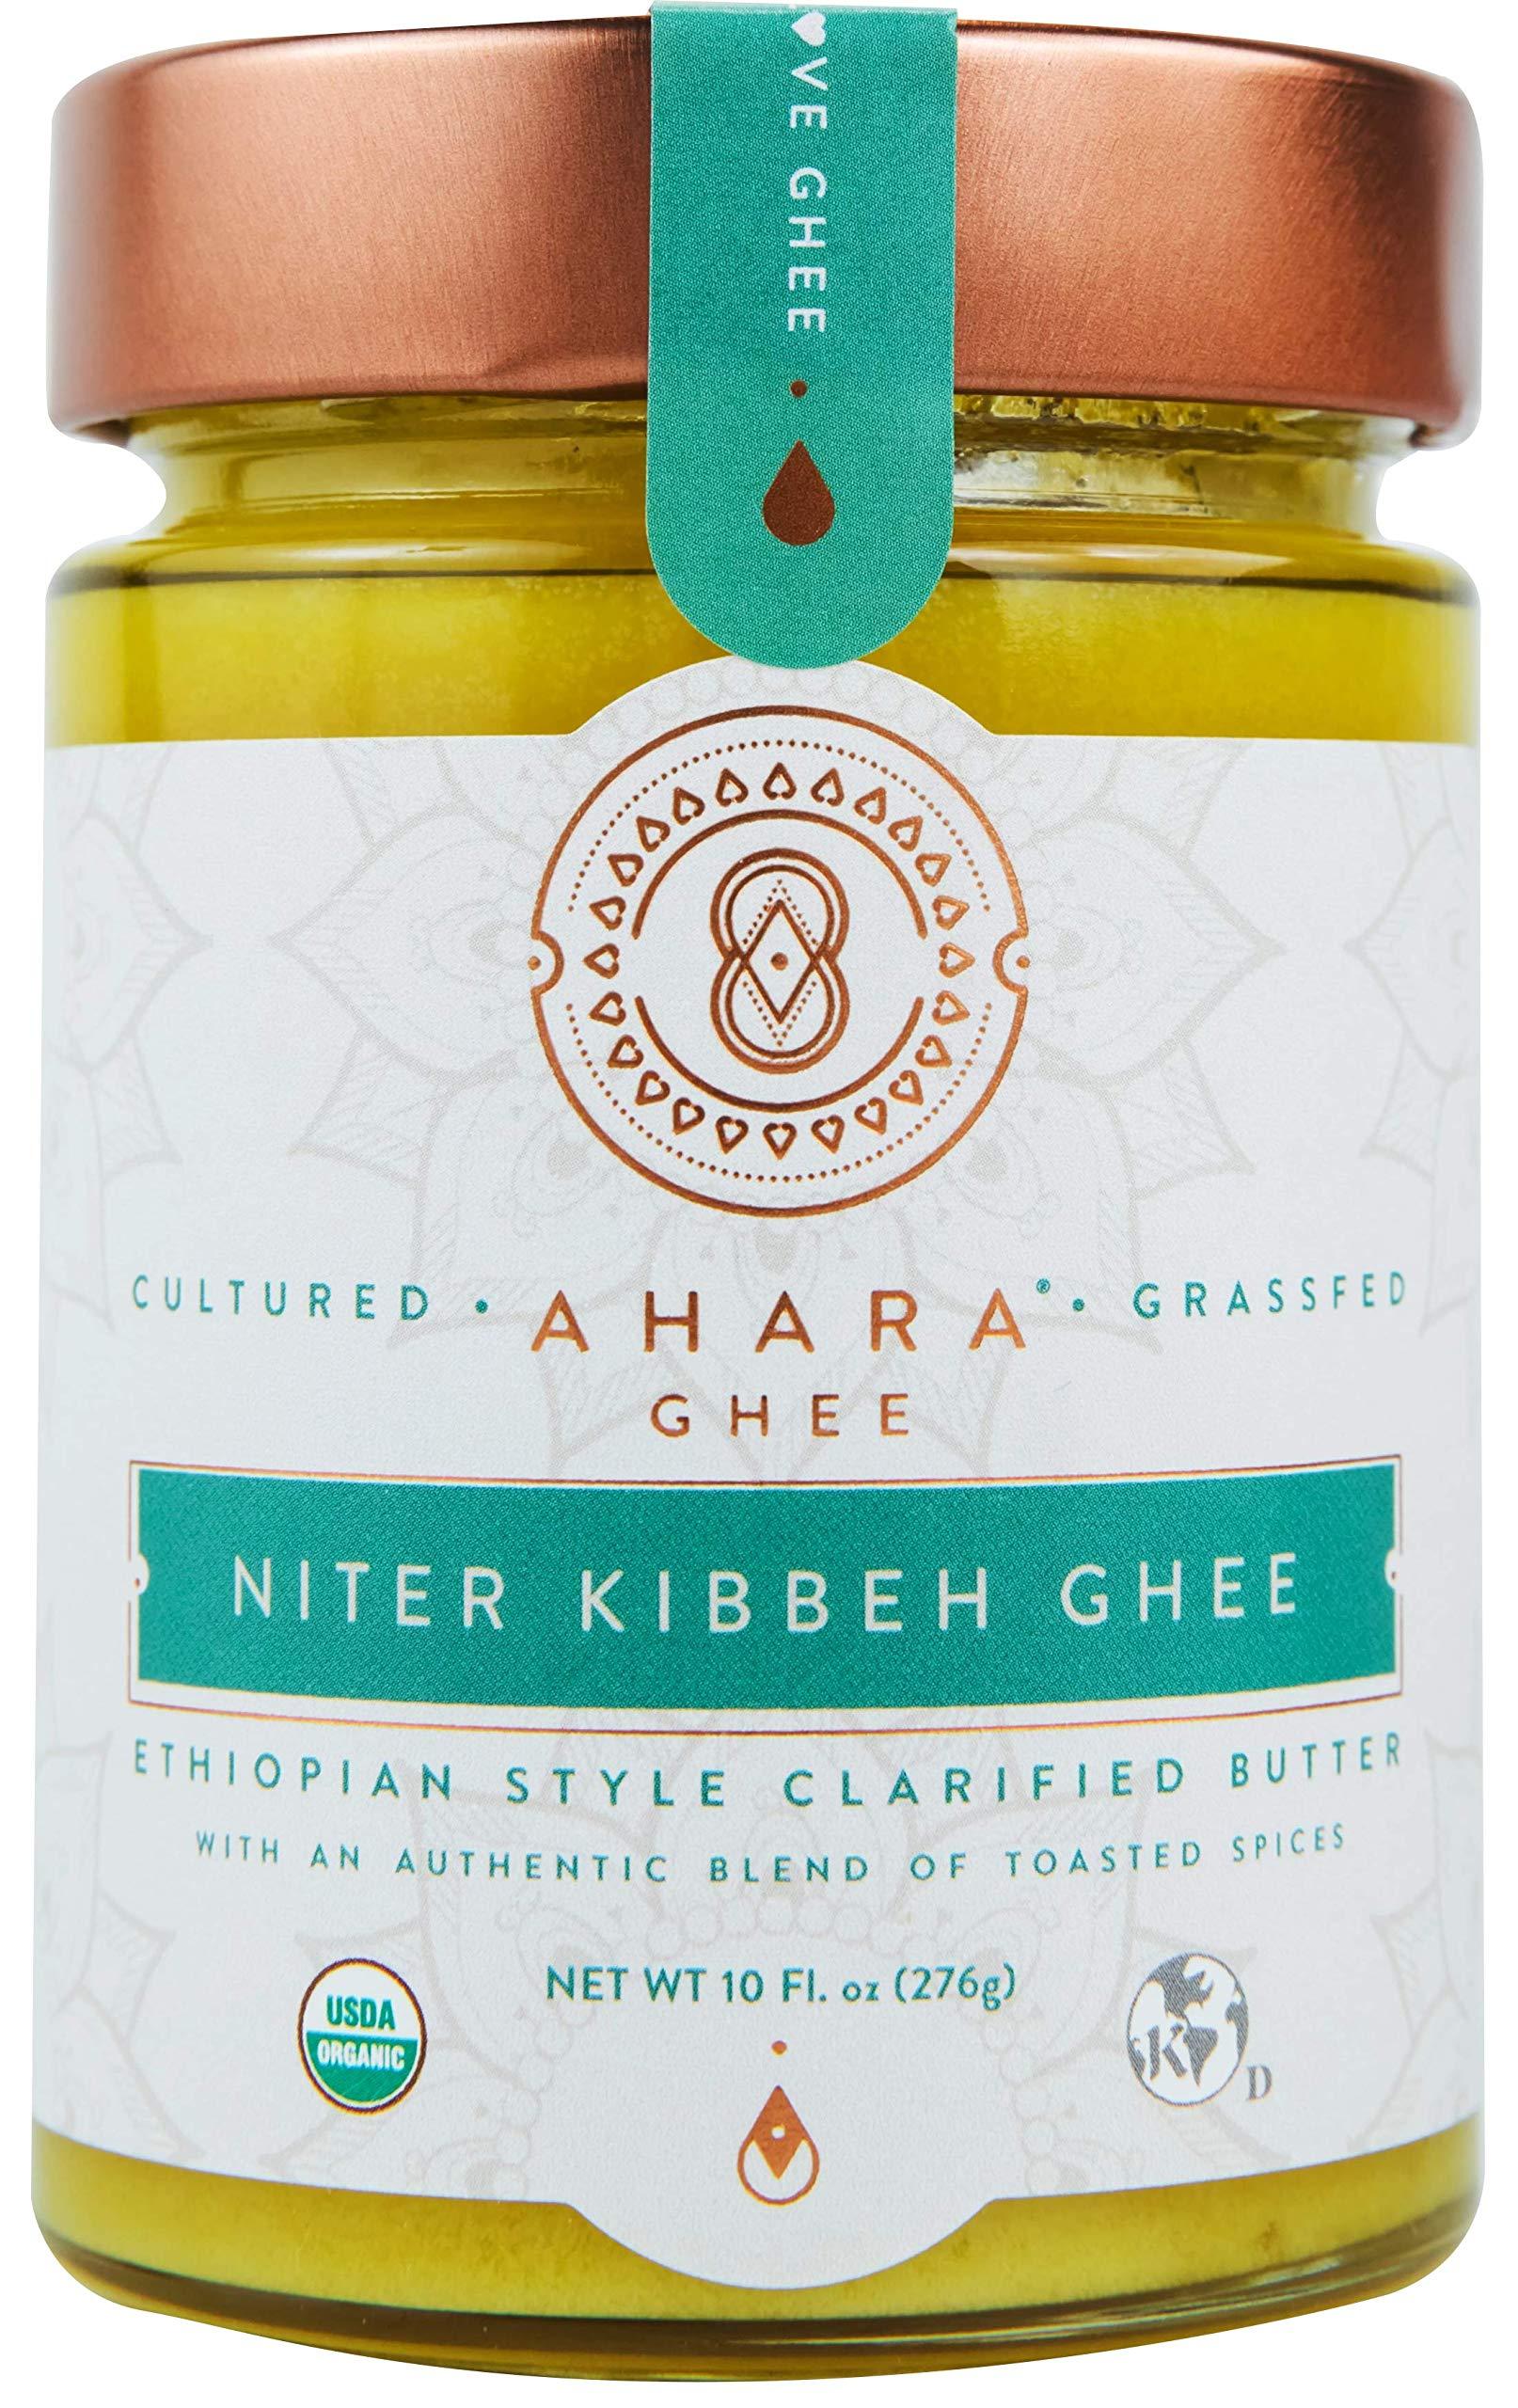 Niter Kibbeh Organic Ghee, Grass-Fed and Cultured - Ethiopian Spiced Ghee - (10 oz)